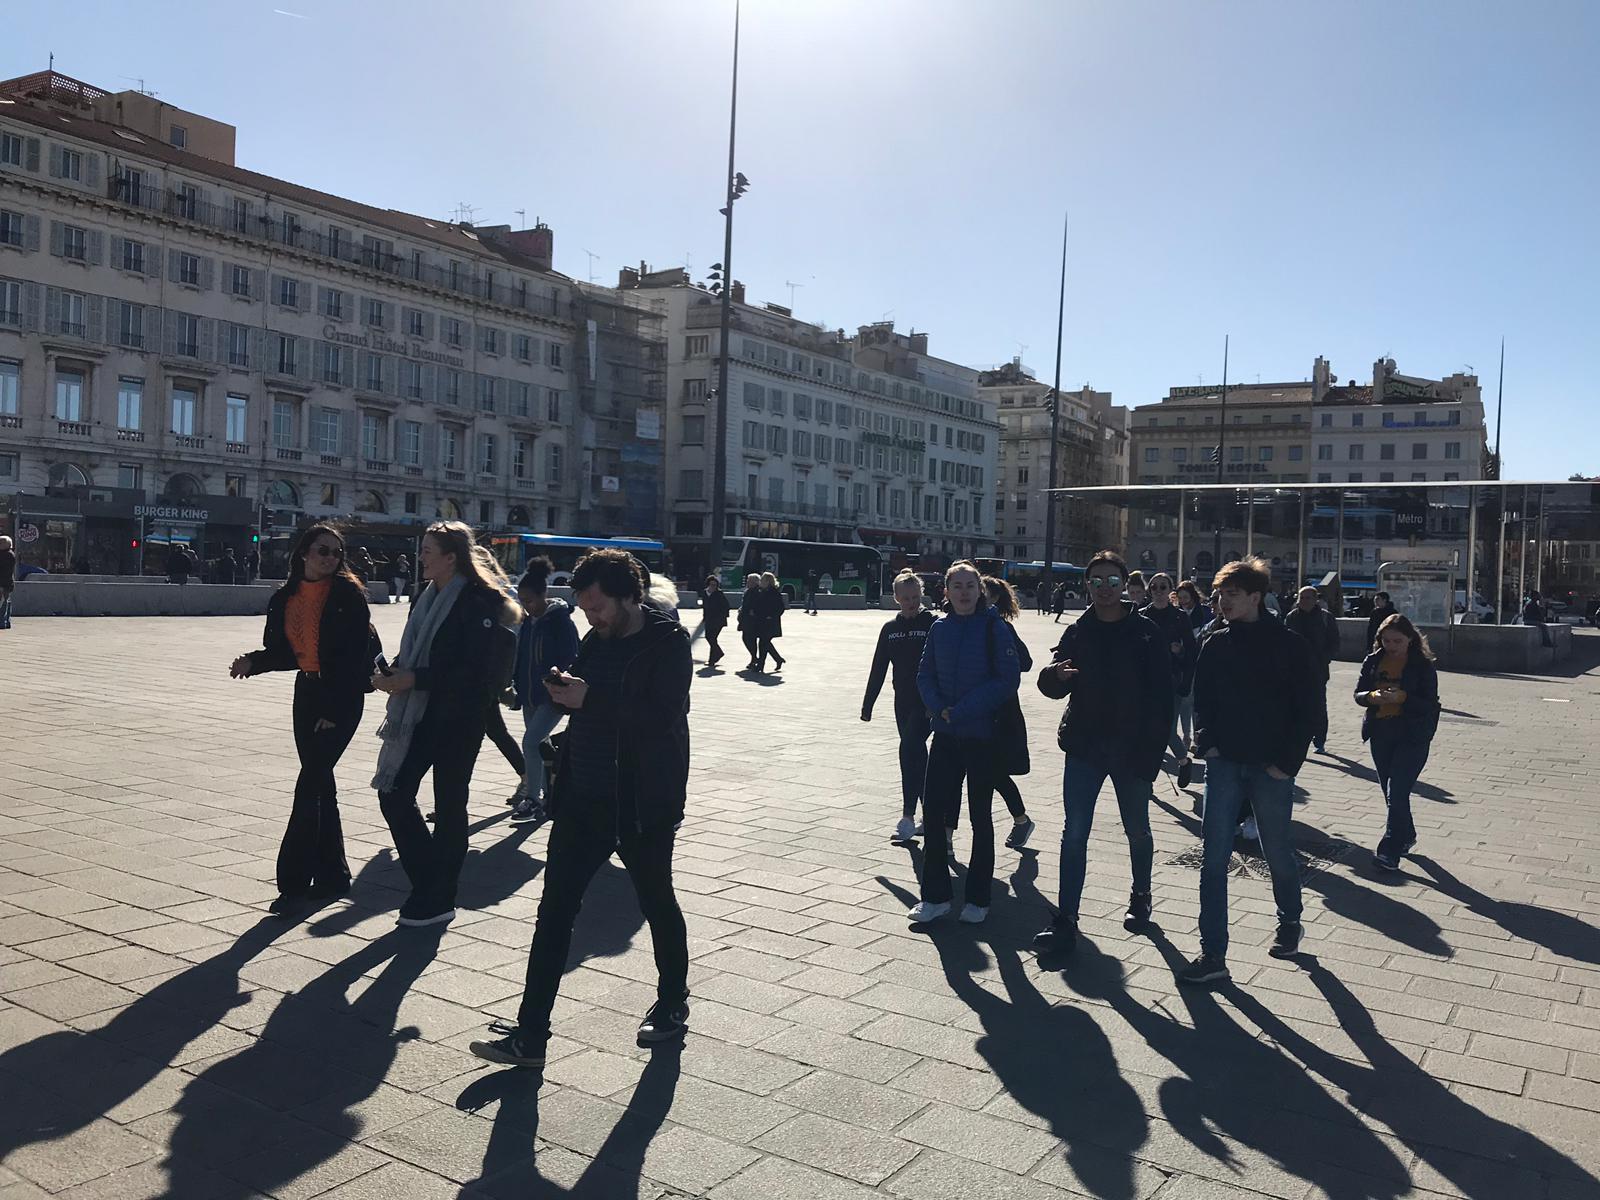 På sightseeing i Marseille mars 2019